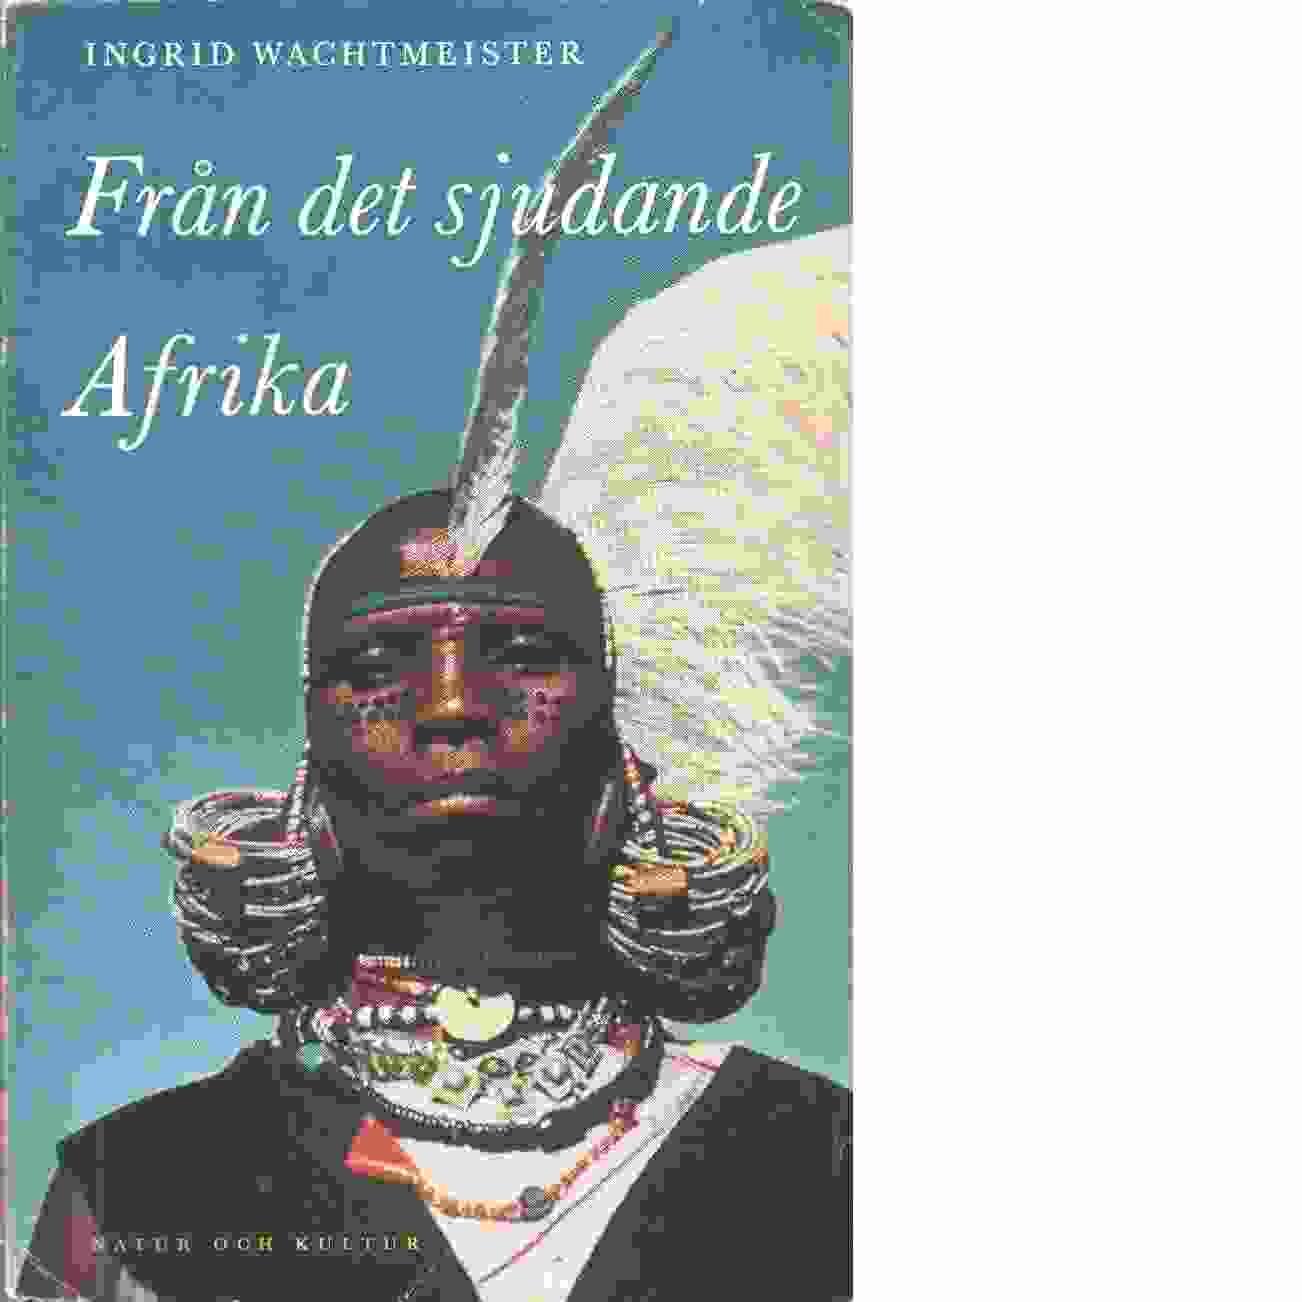 Från det sjudande Afrika : reseskildring - Wachtmeister, Ingrid